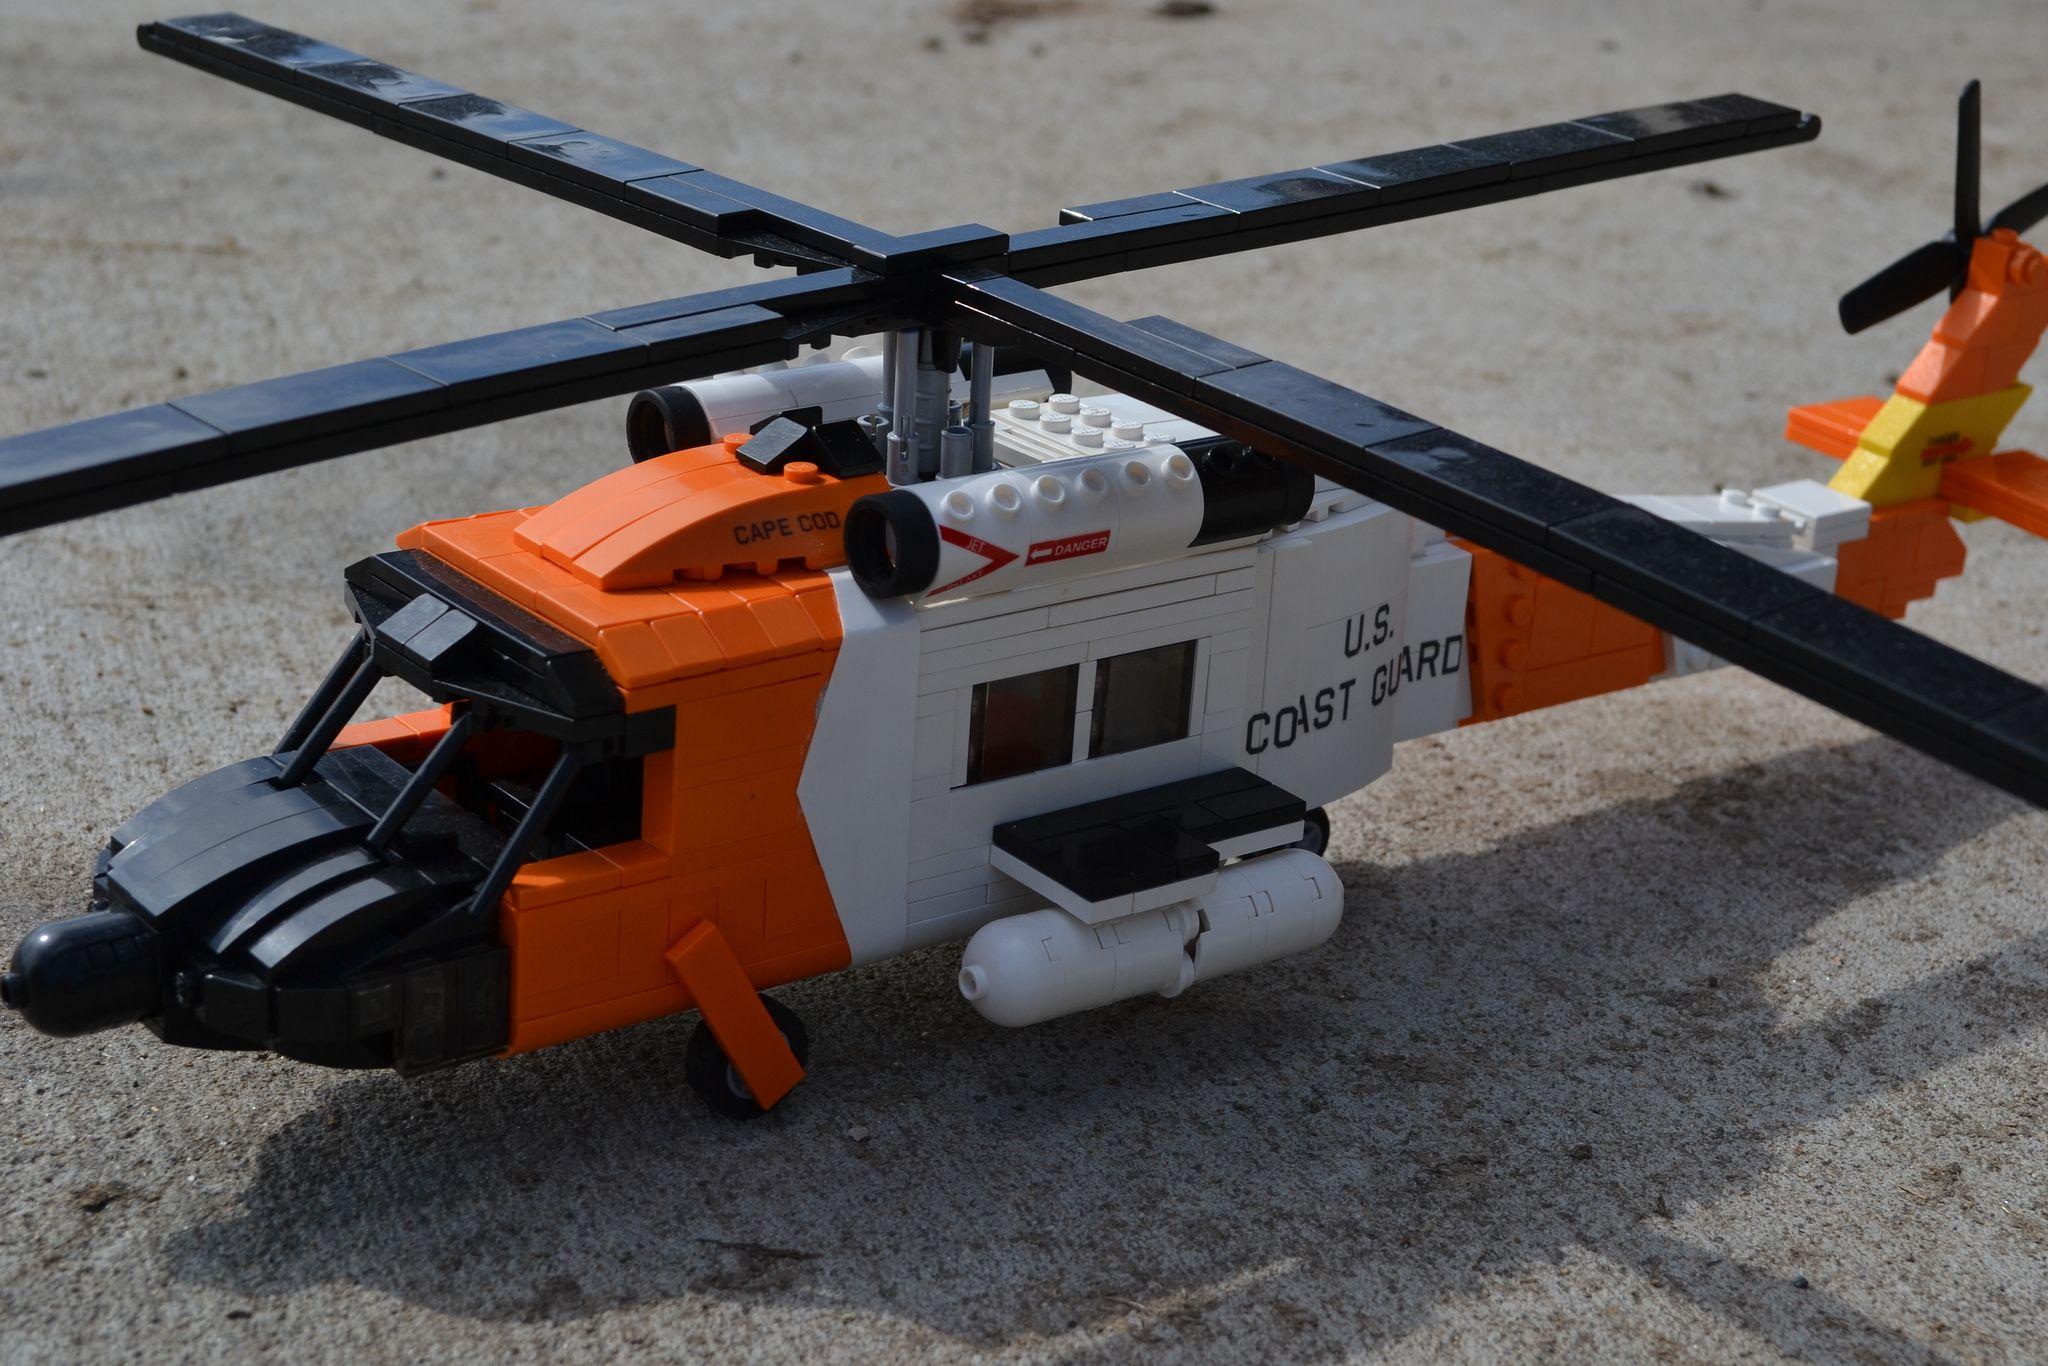 Pin on Lego - aeronave & espacio